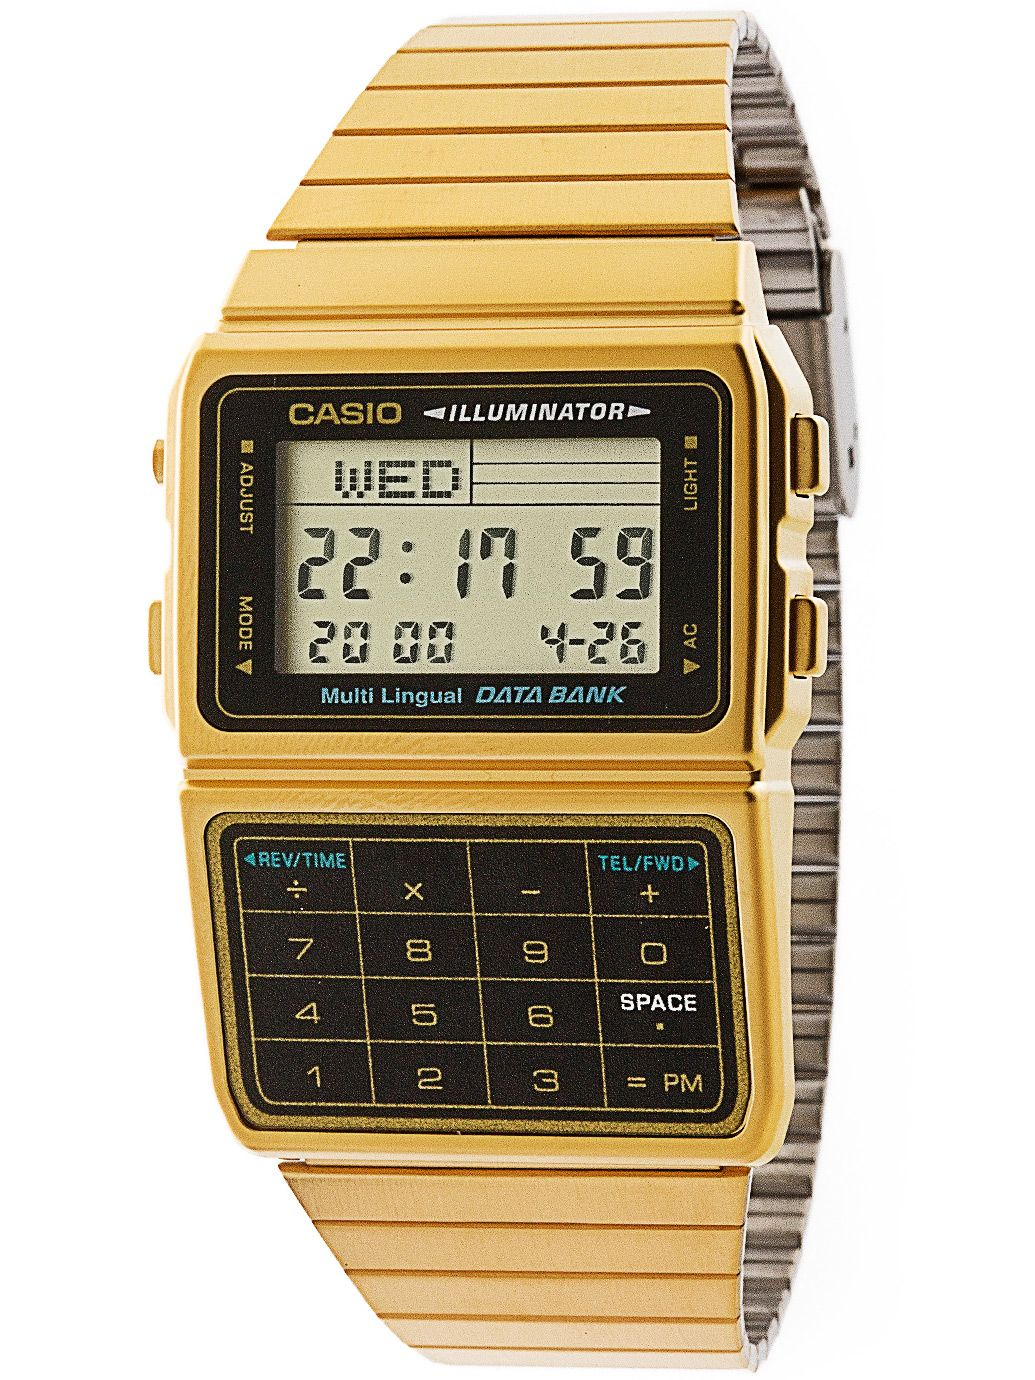 dbc611g 1d casio gold black digital american apparel